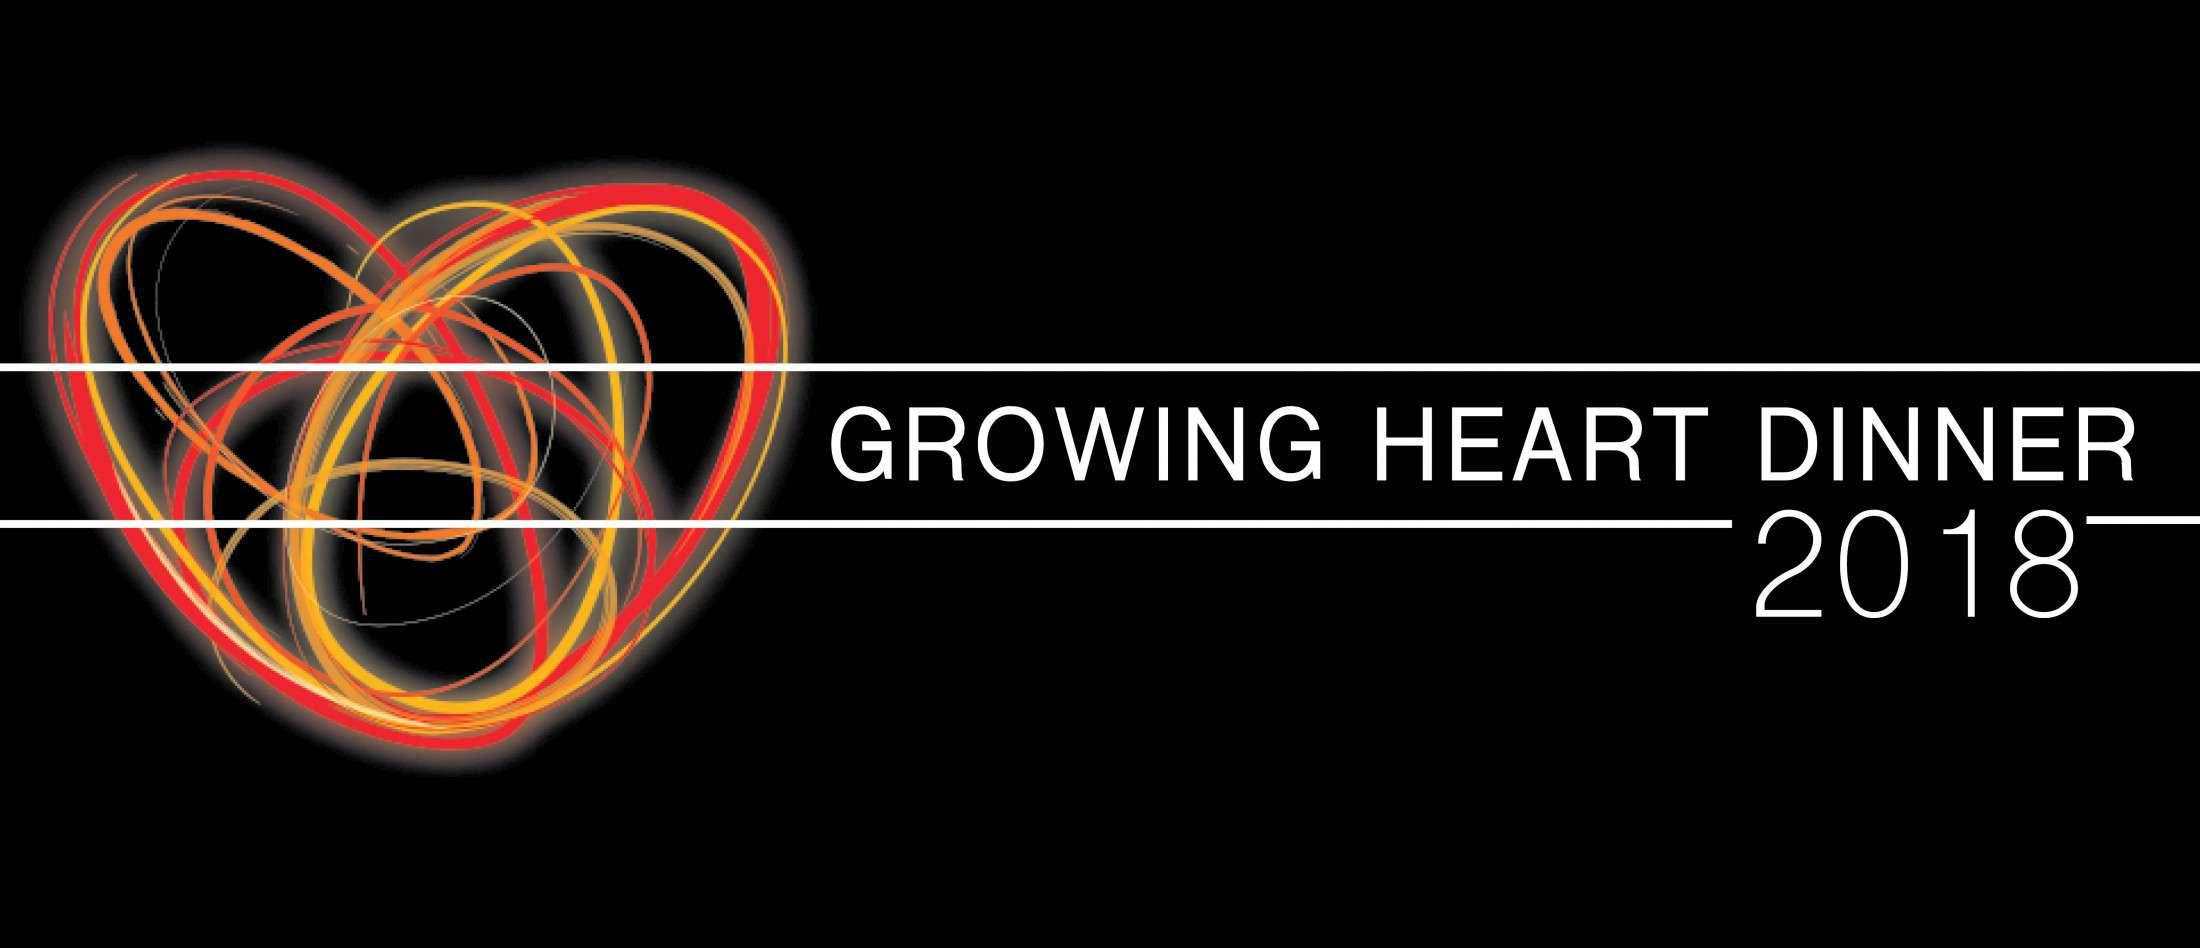 Growing Heart Dinner Header